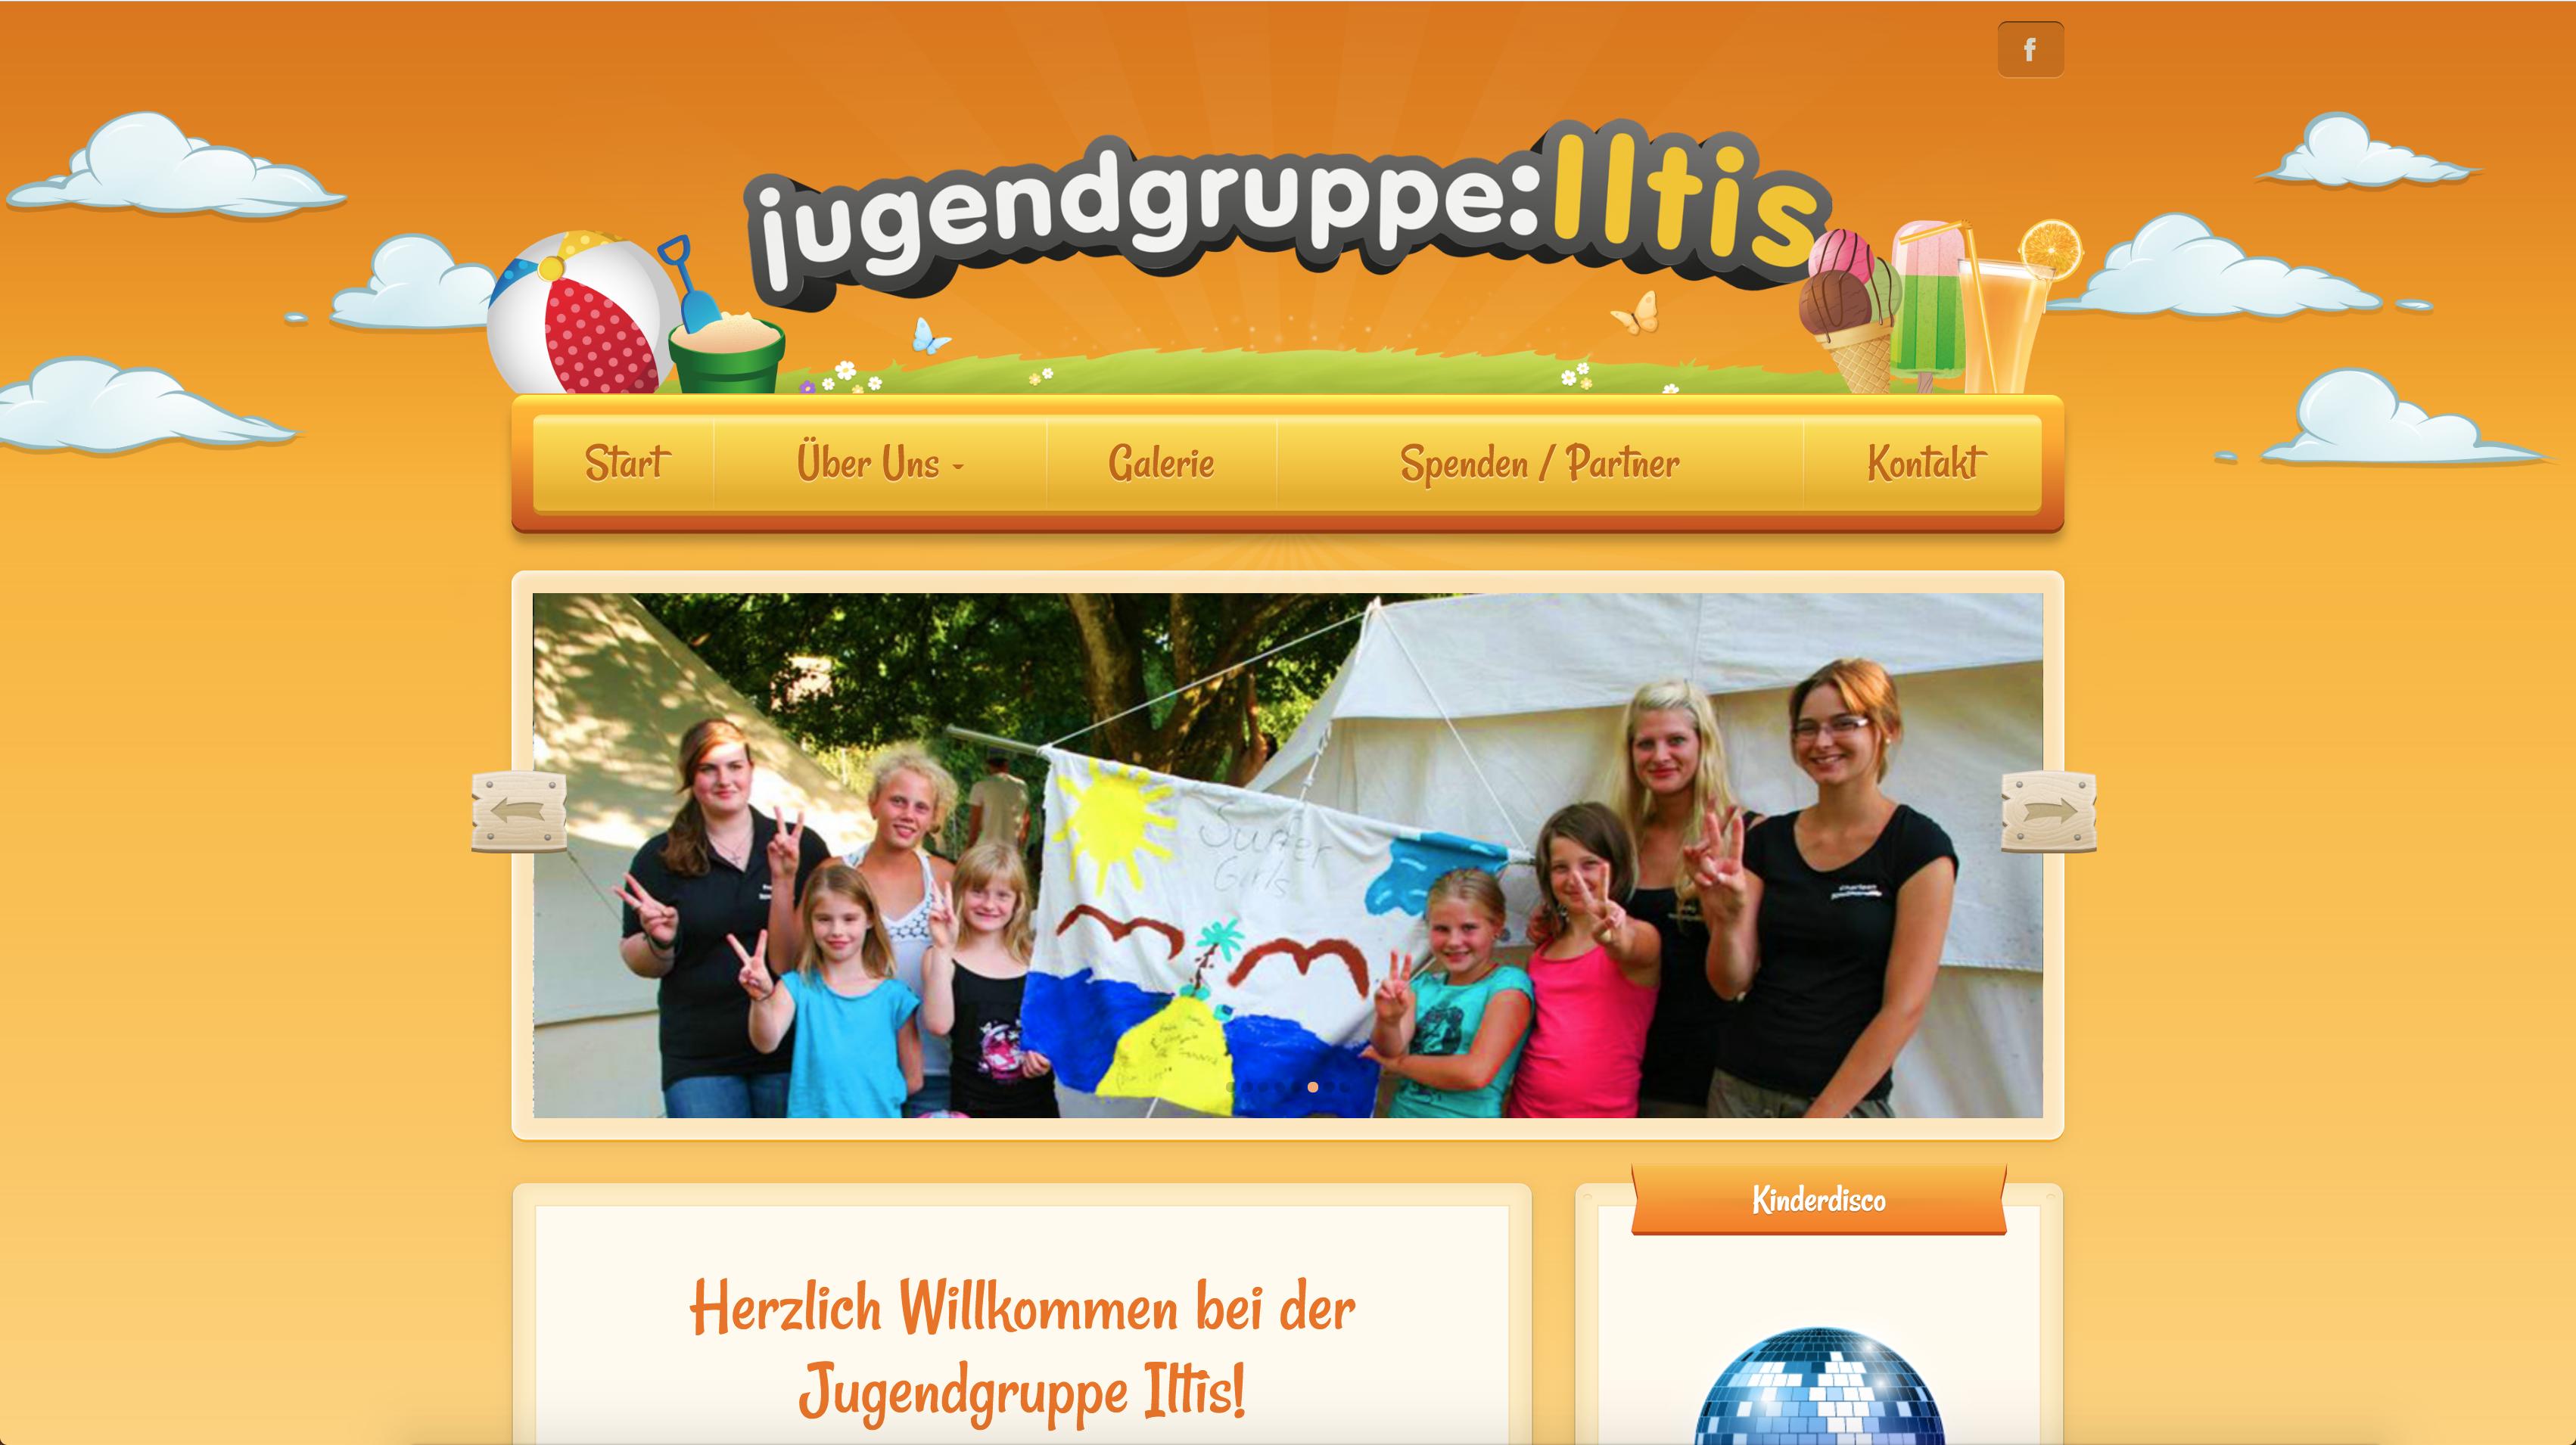 jugendgruppe-iltis-website